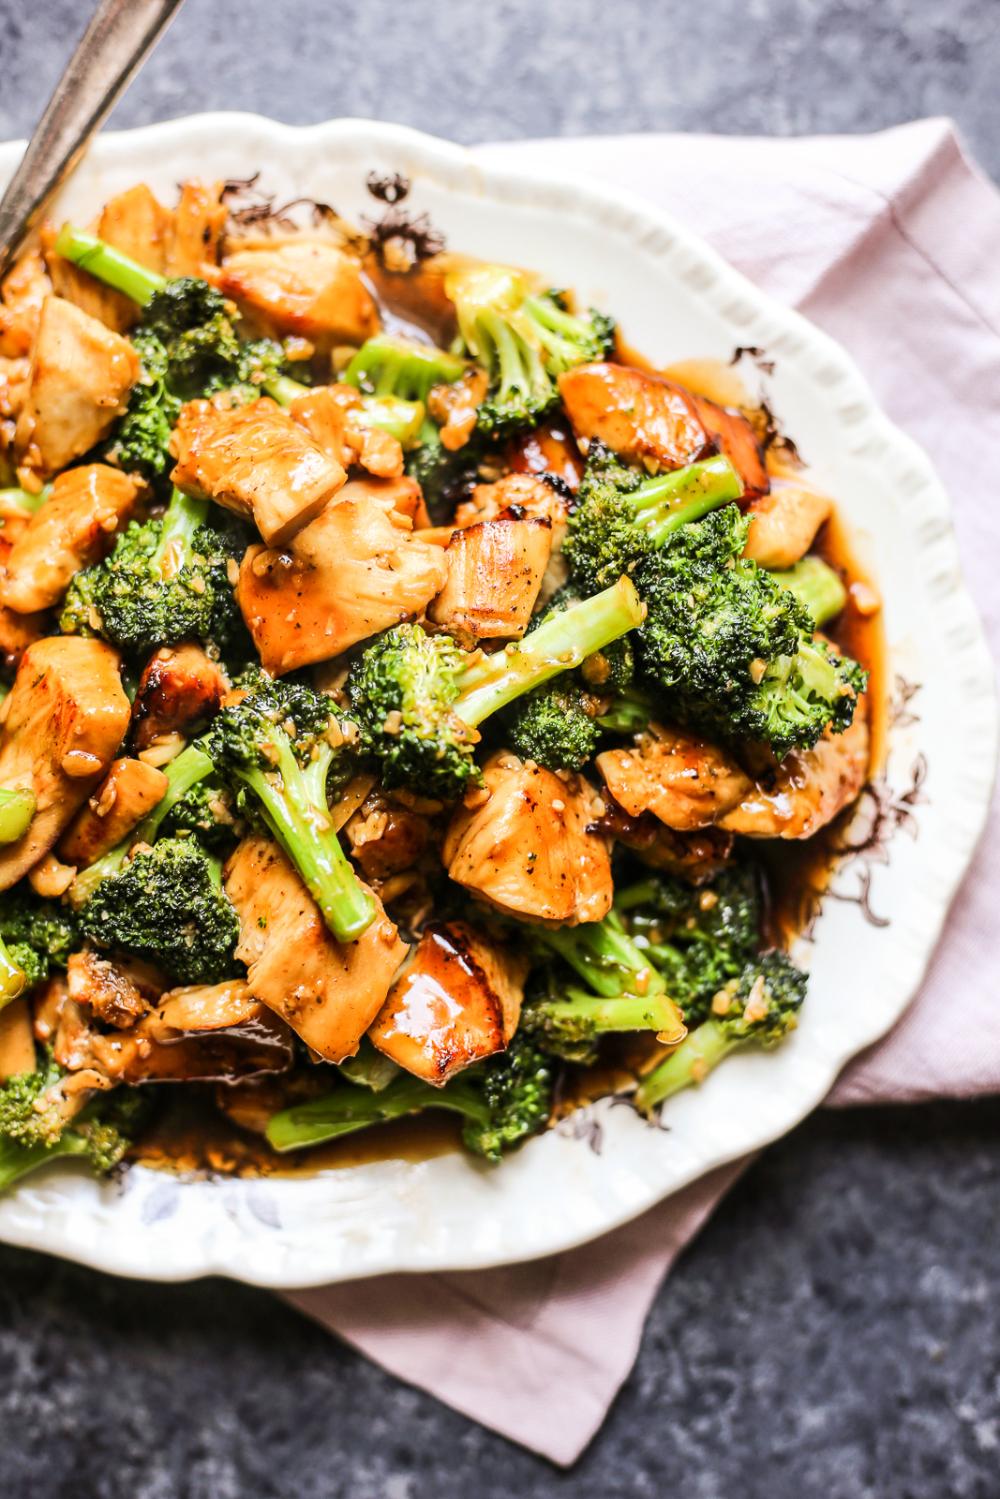 Chicken and Broccoli Recipe Whole food recipes